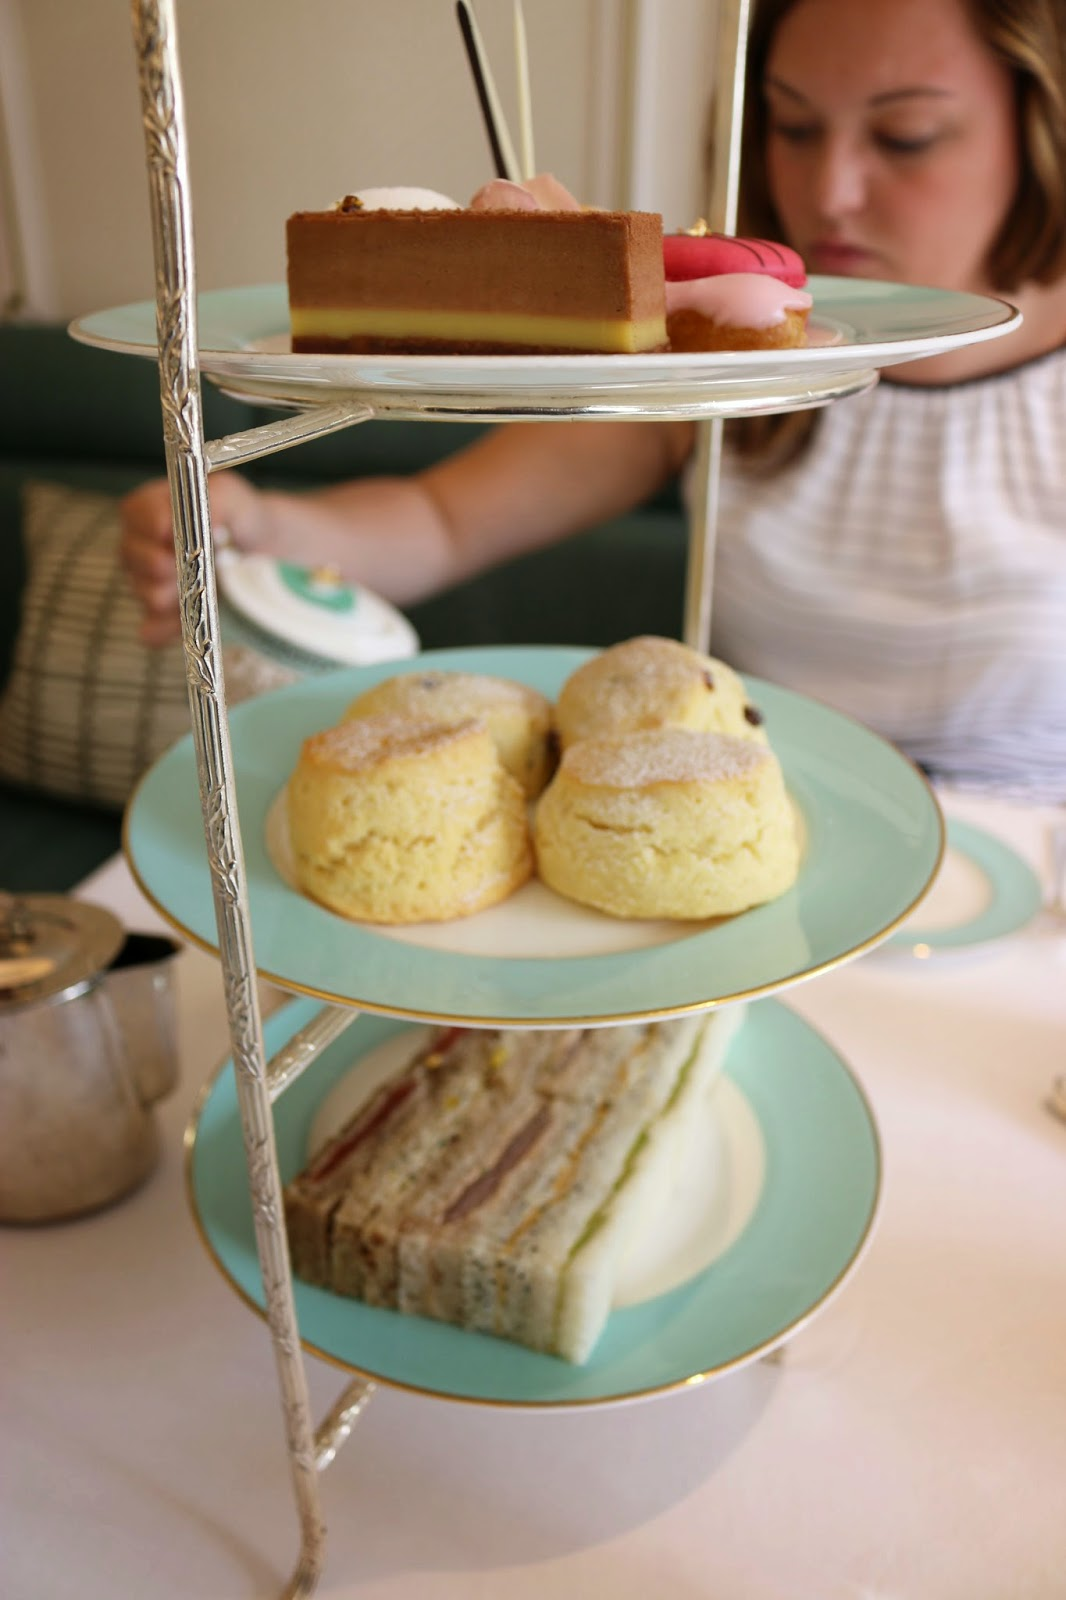 Fortnum & Mason Diamond Jubilee Tea Salon - Finger Sandwiches and Pastries